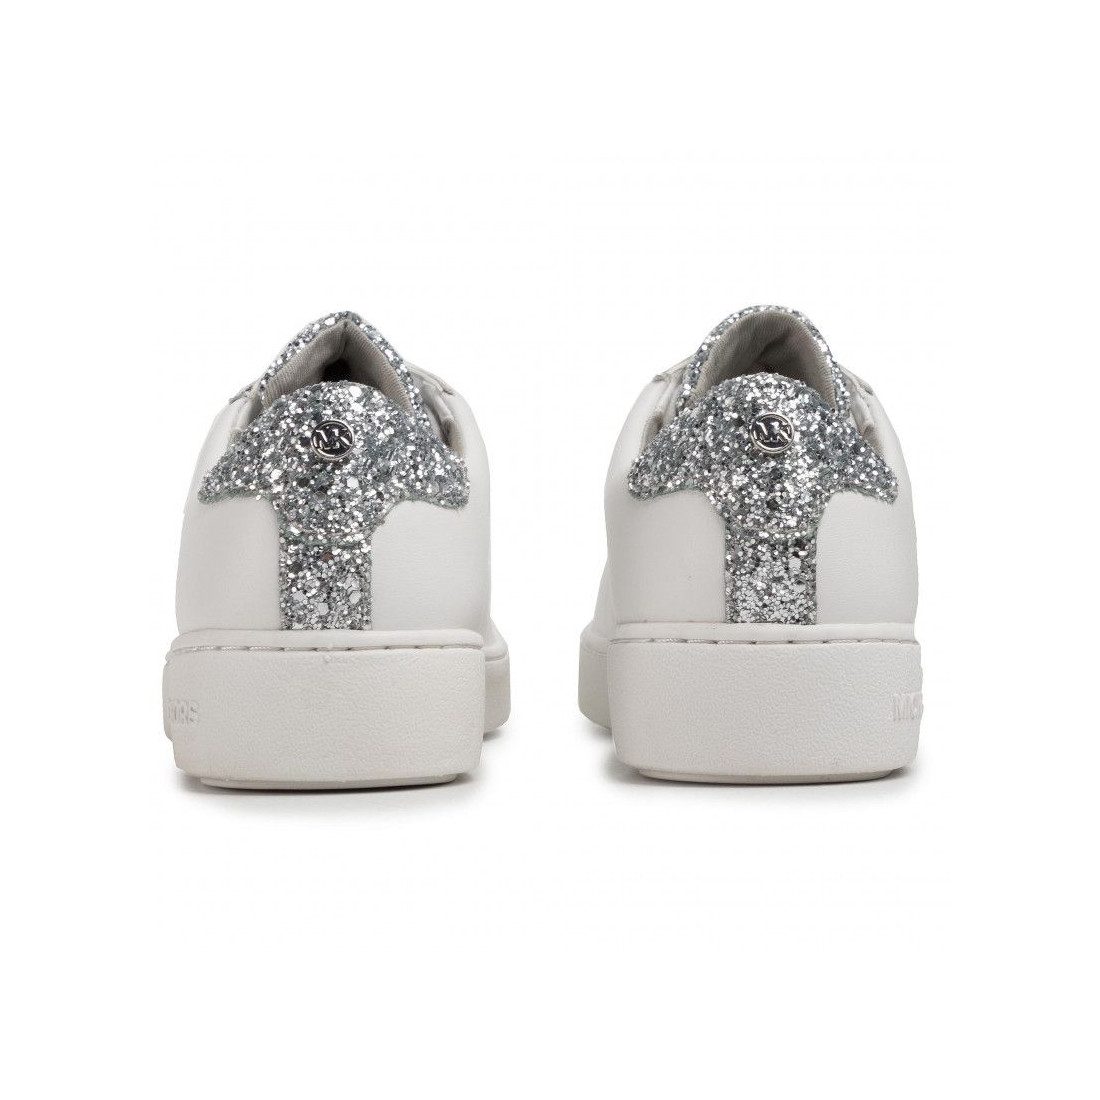 sneakers donna michael kors 43s6irfs1l898 7352